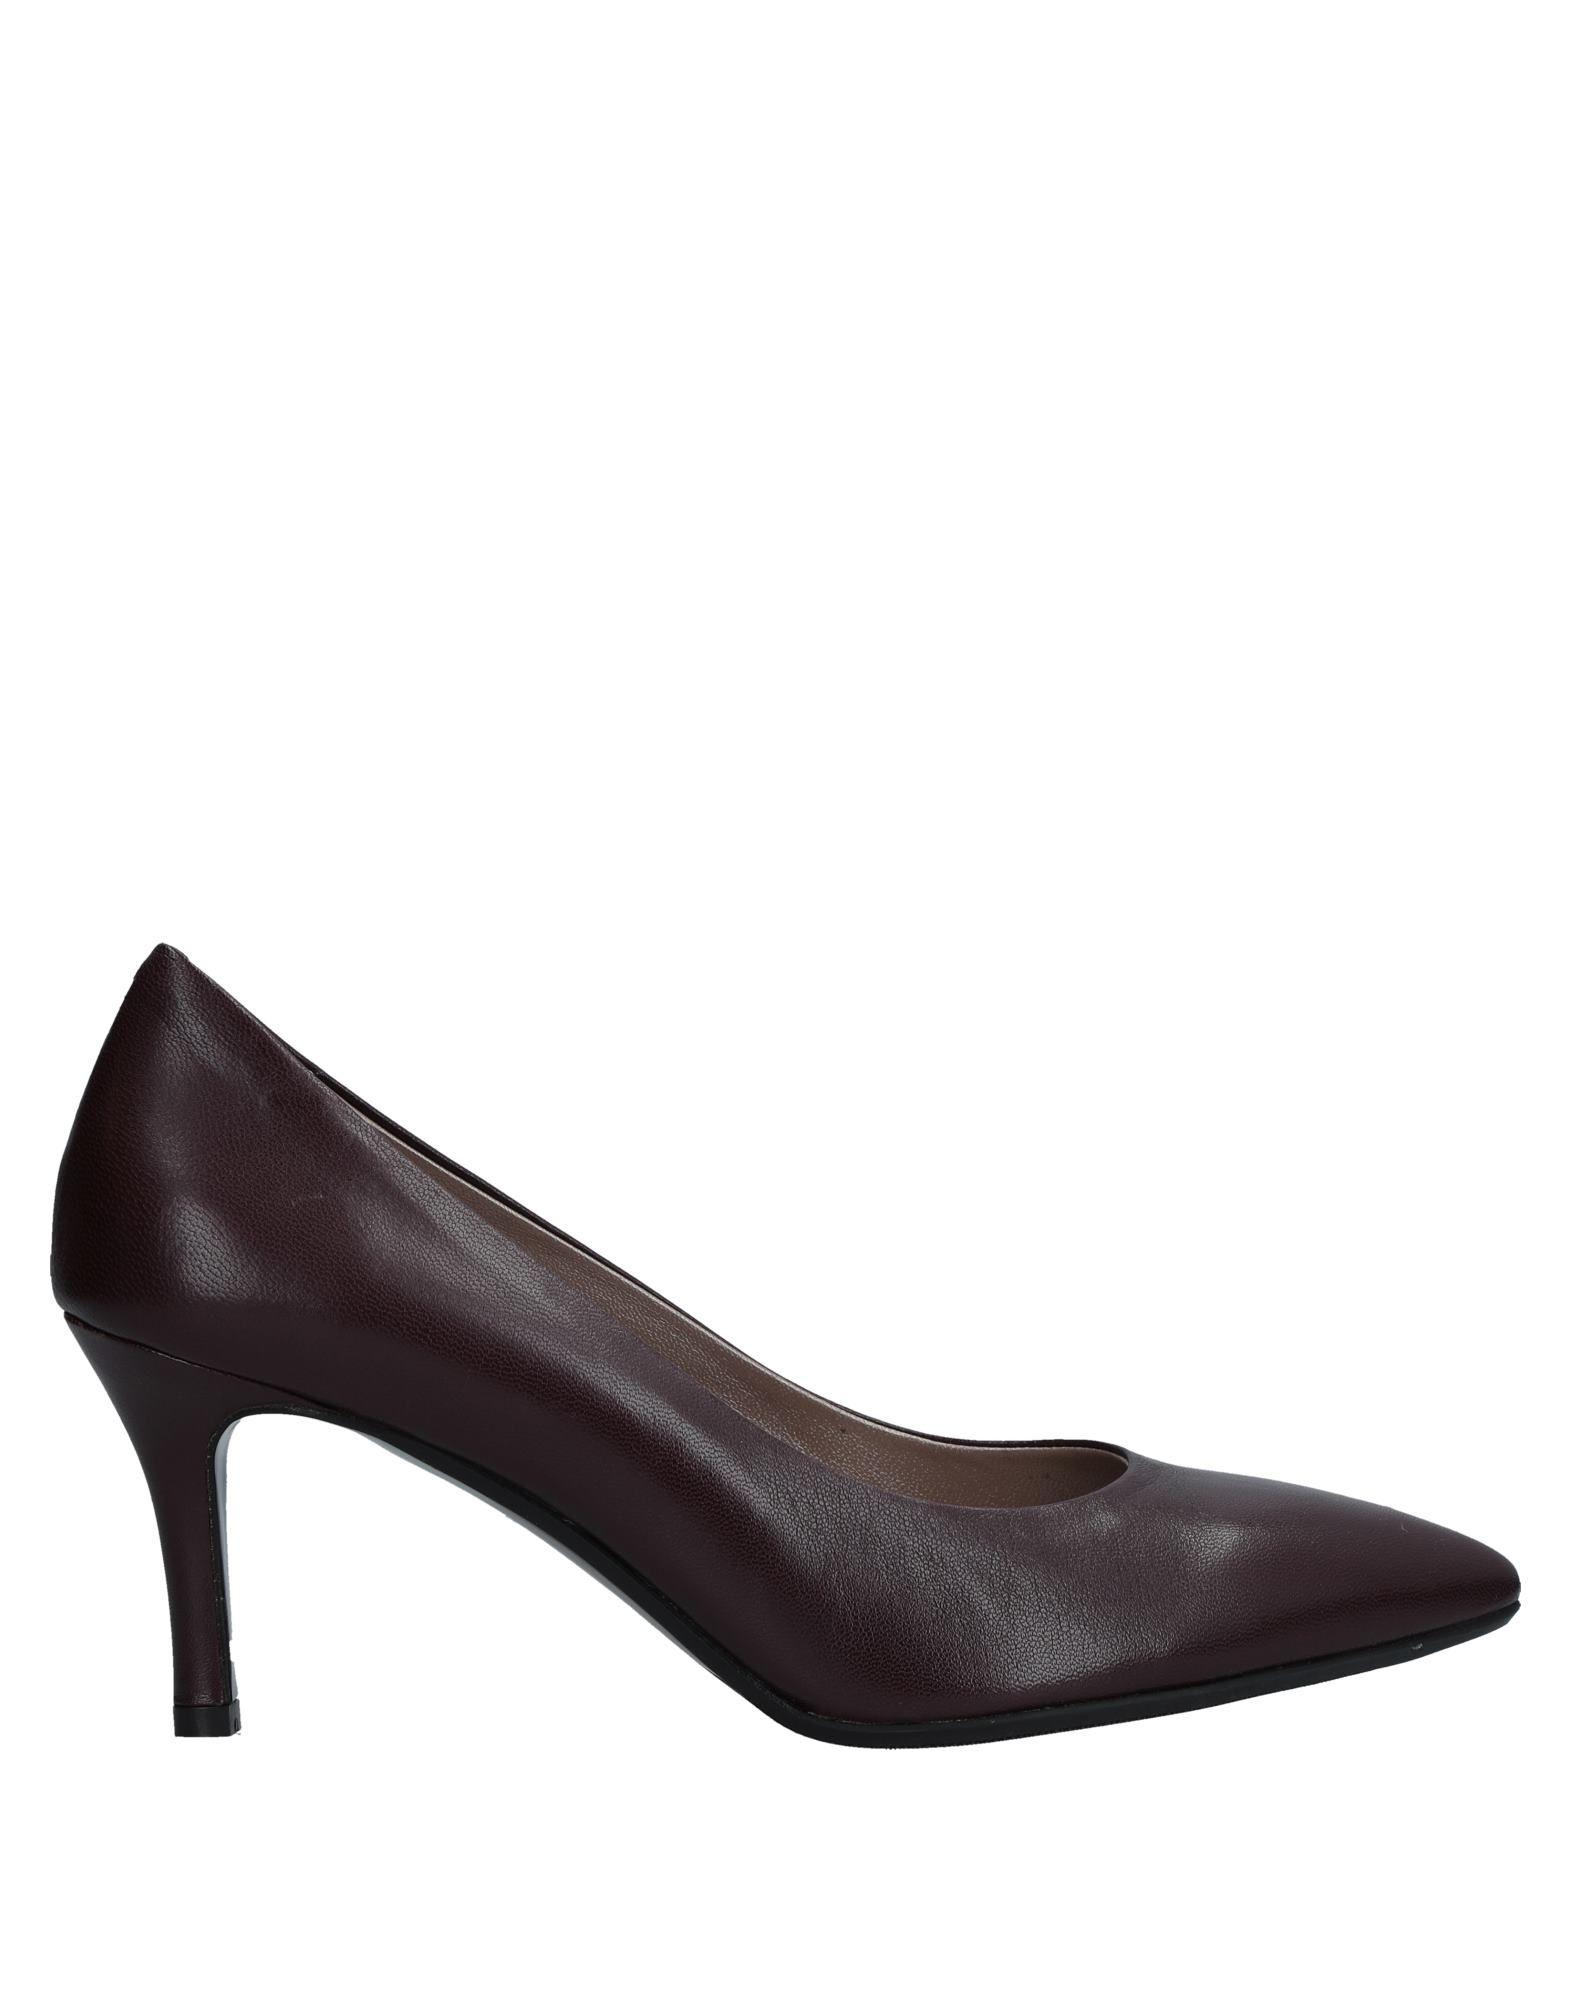 Melluso Pumps Damen  11535027TW Gute Qualität beliebte Schuhe